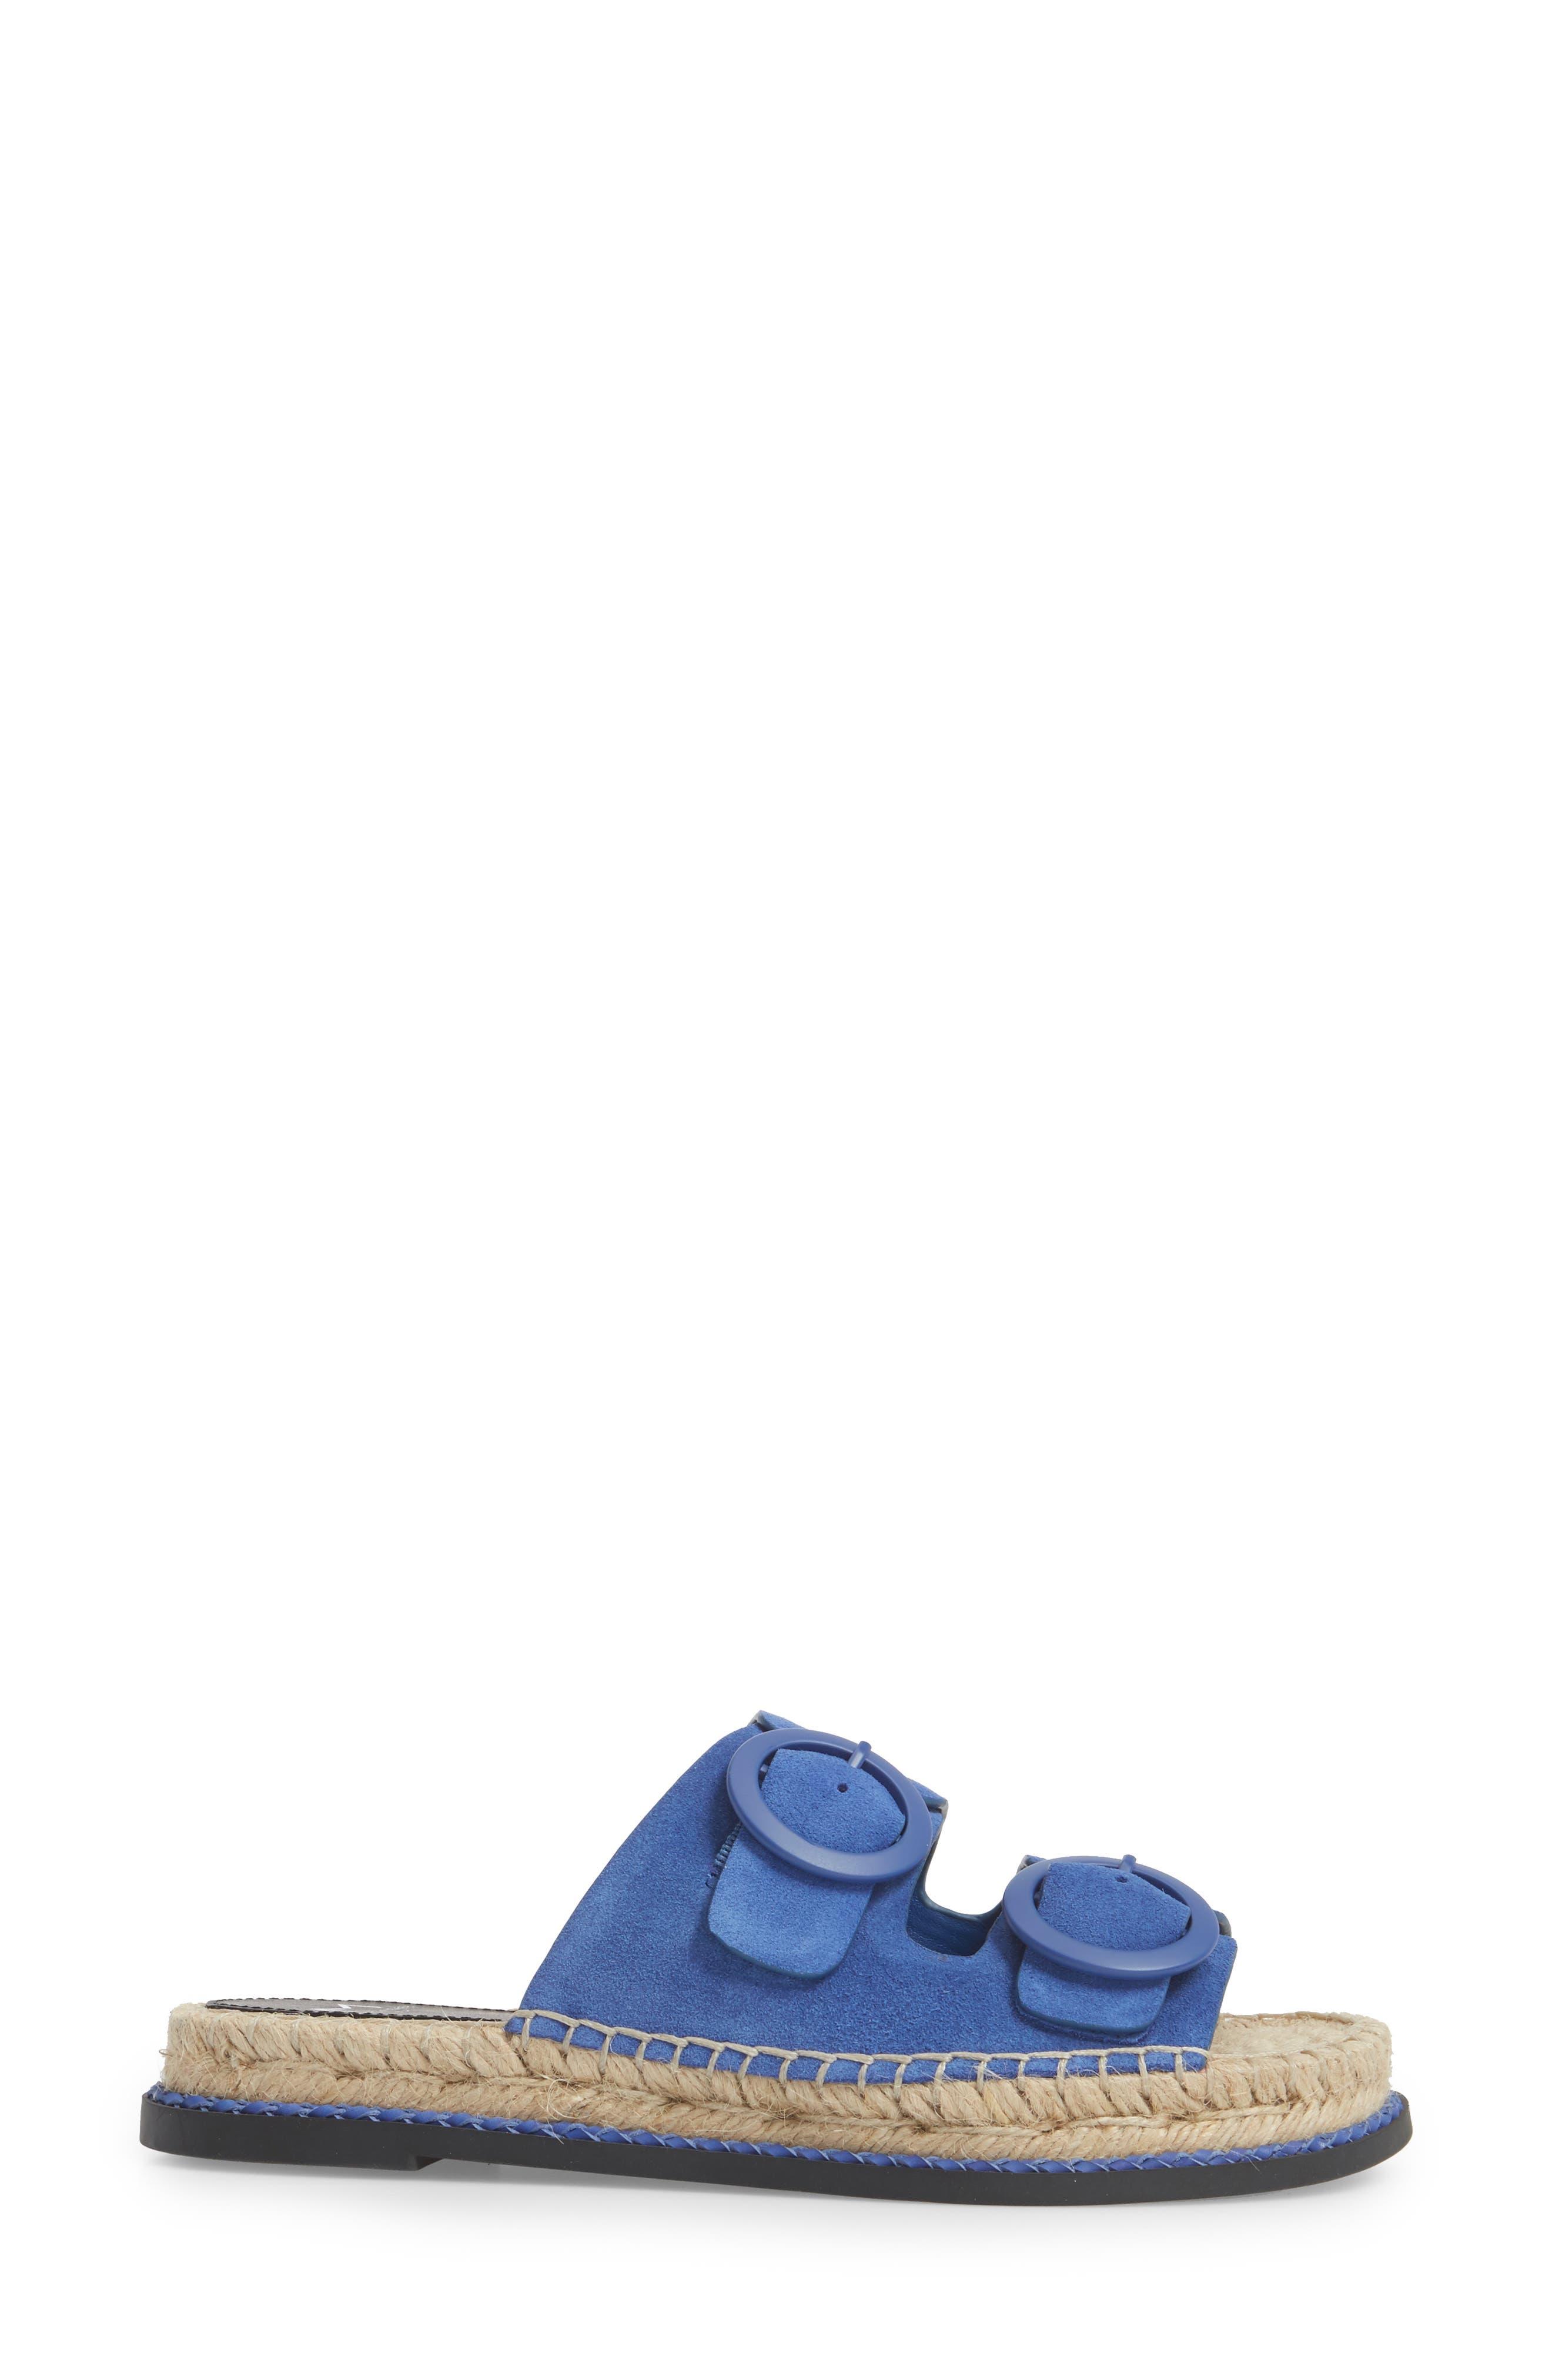 Ramba Espadrille Slide Sandal,                             Alternate thumbnail 8, color,